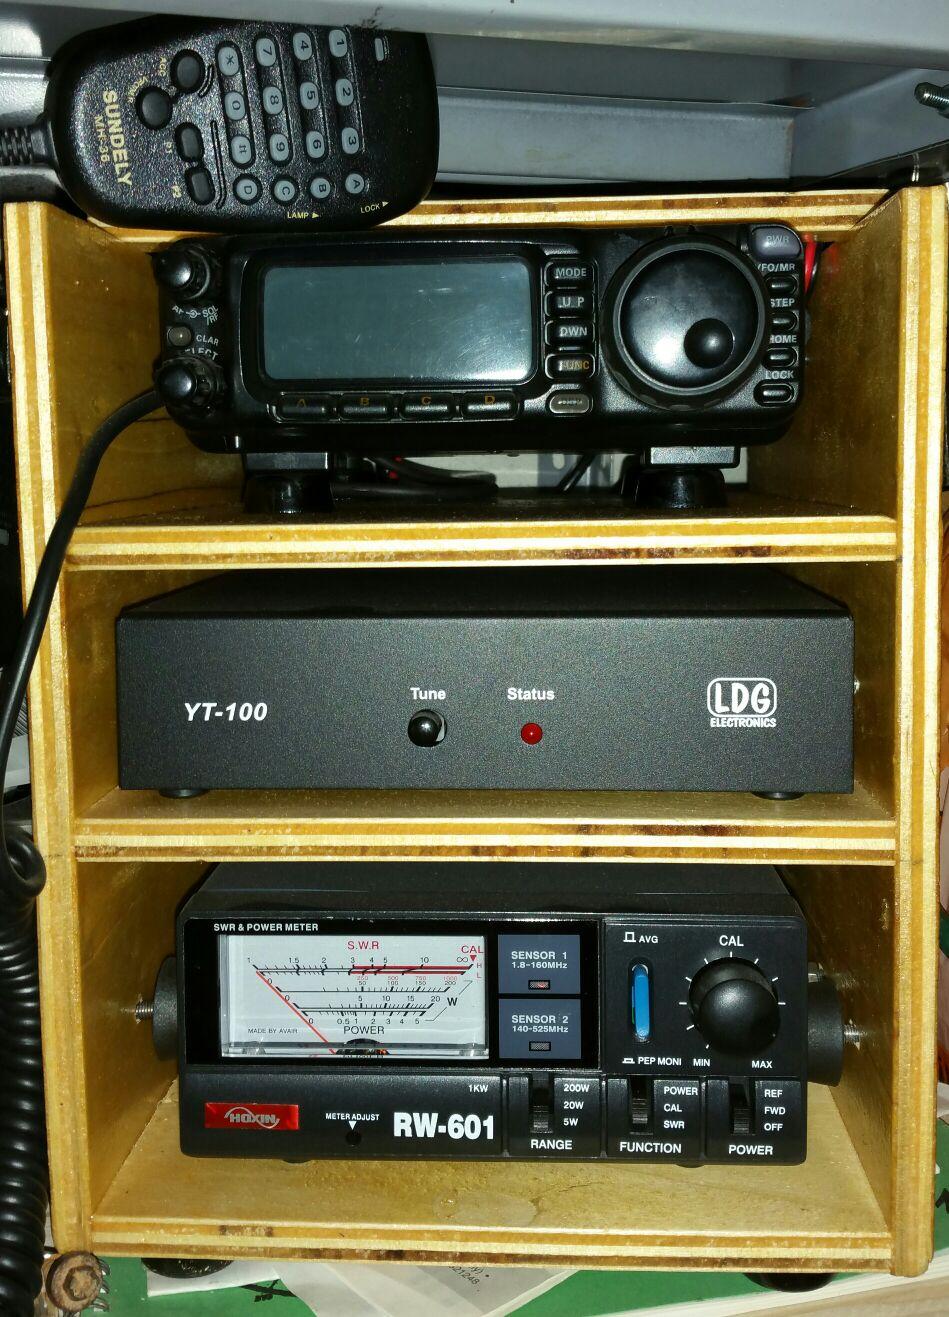 YAESU FT-100D + LDG YT-100 + HOXIN RW-601 ESCAPE='HTML'